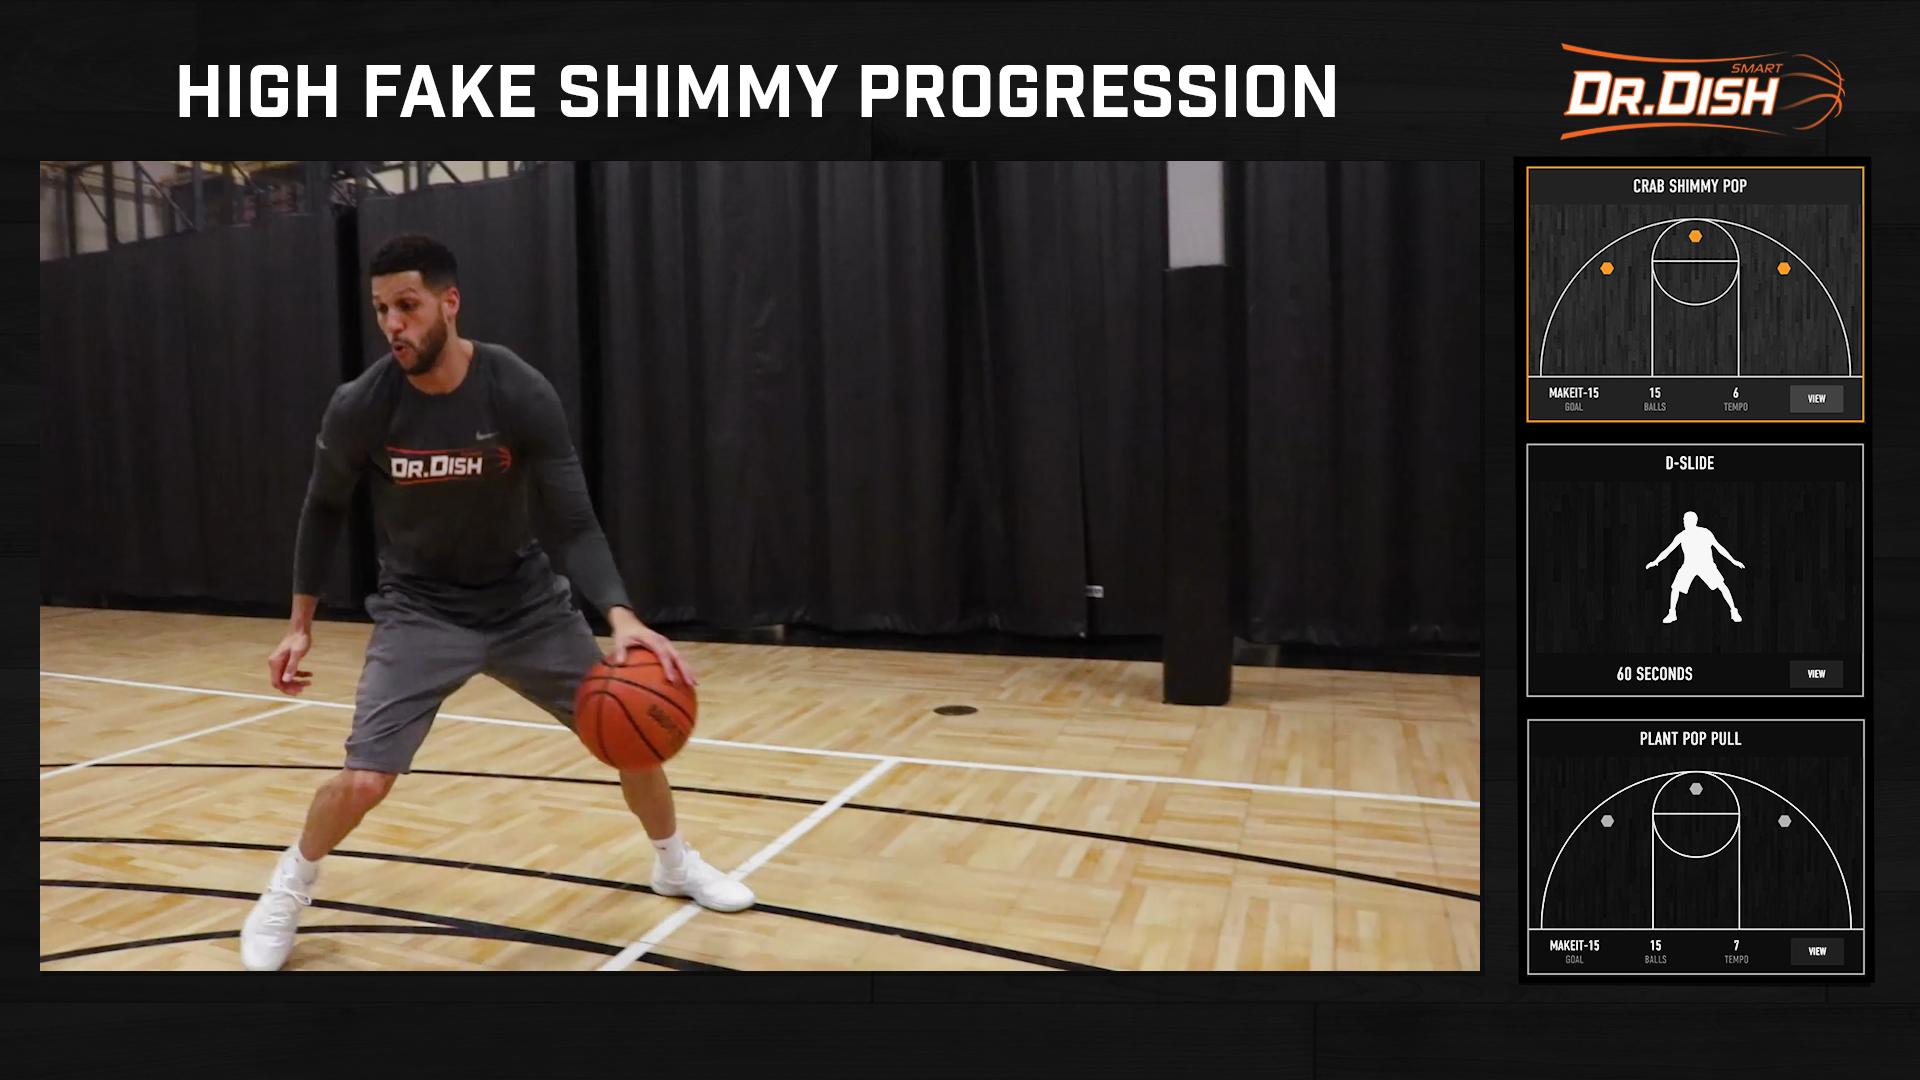 Basketball Drills: High Fake Shimmy Pop Progression Skill Builder Workout